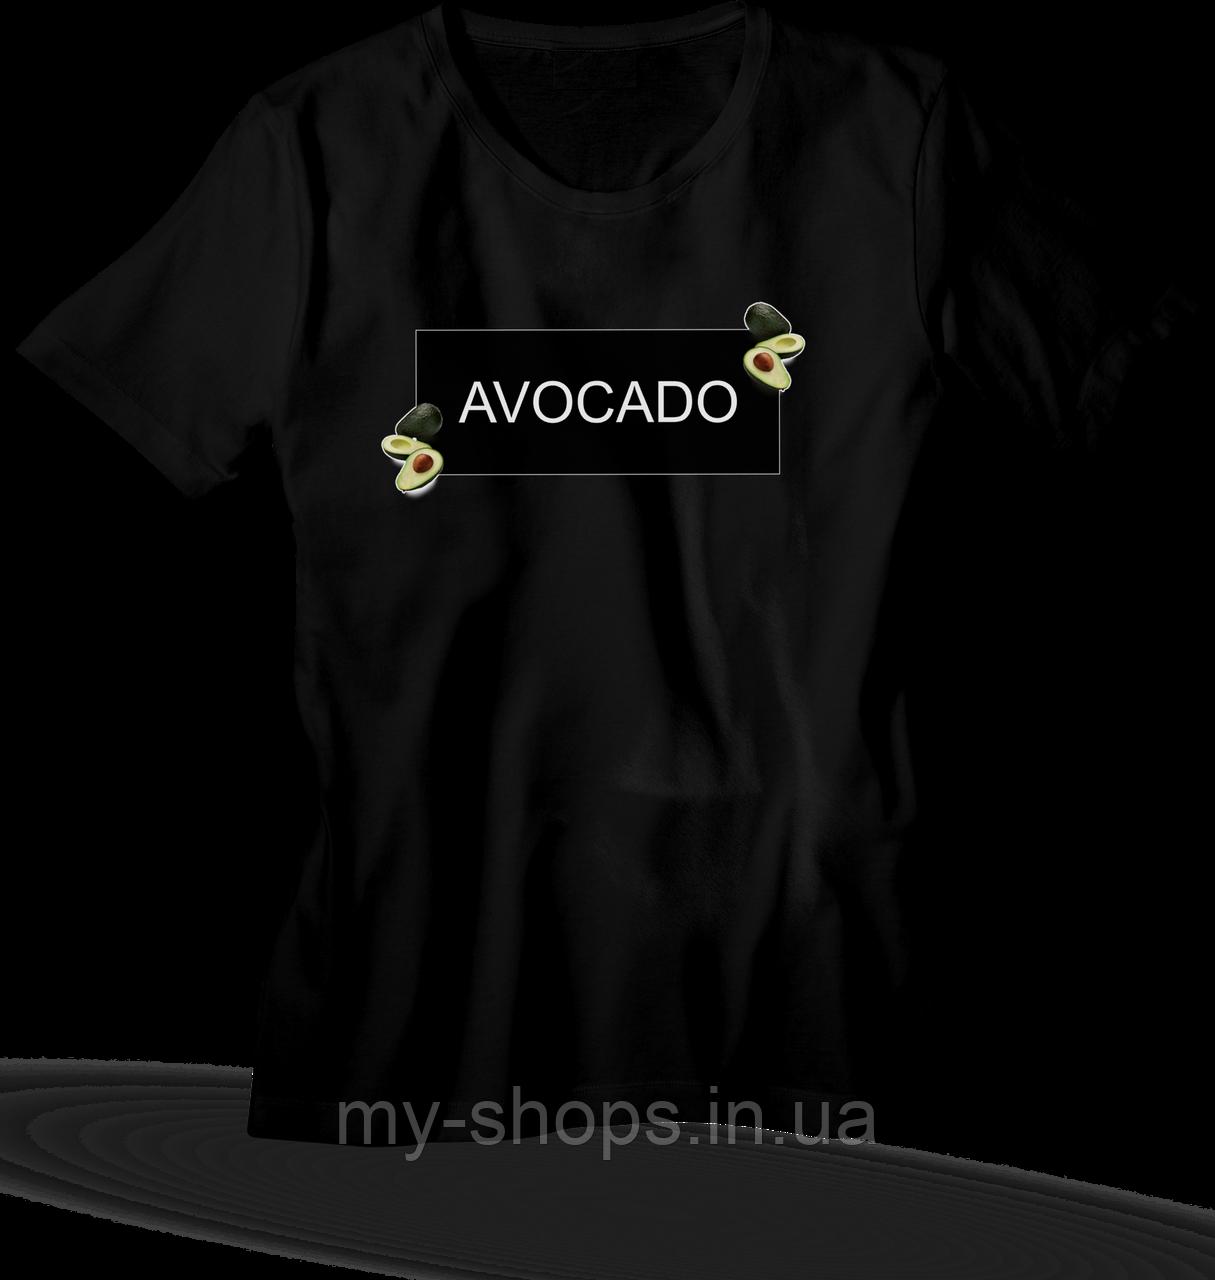 Женские футболки avocado